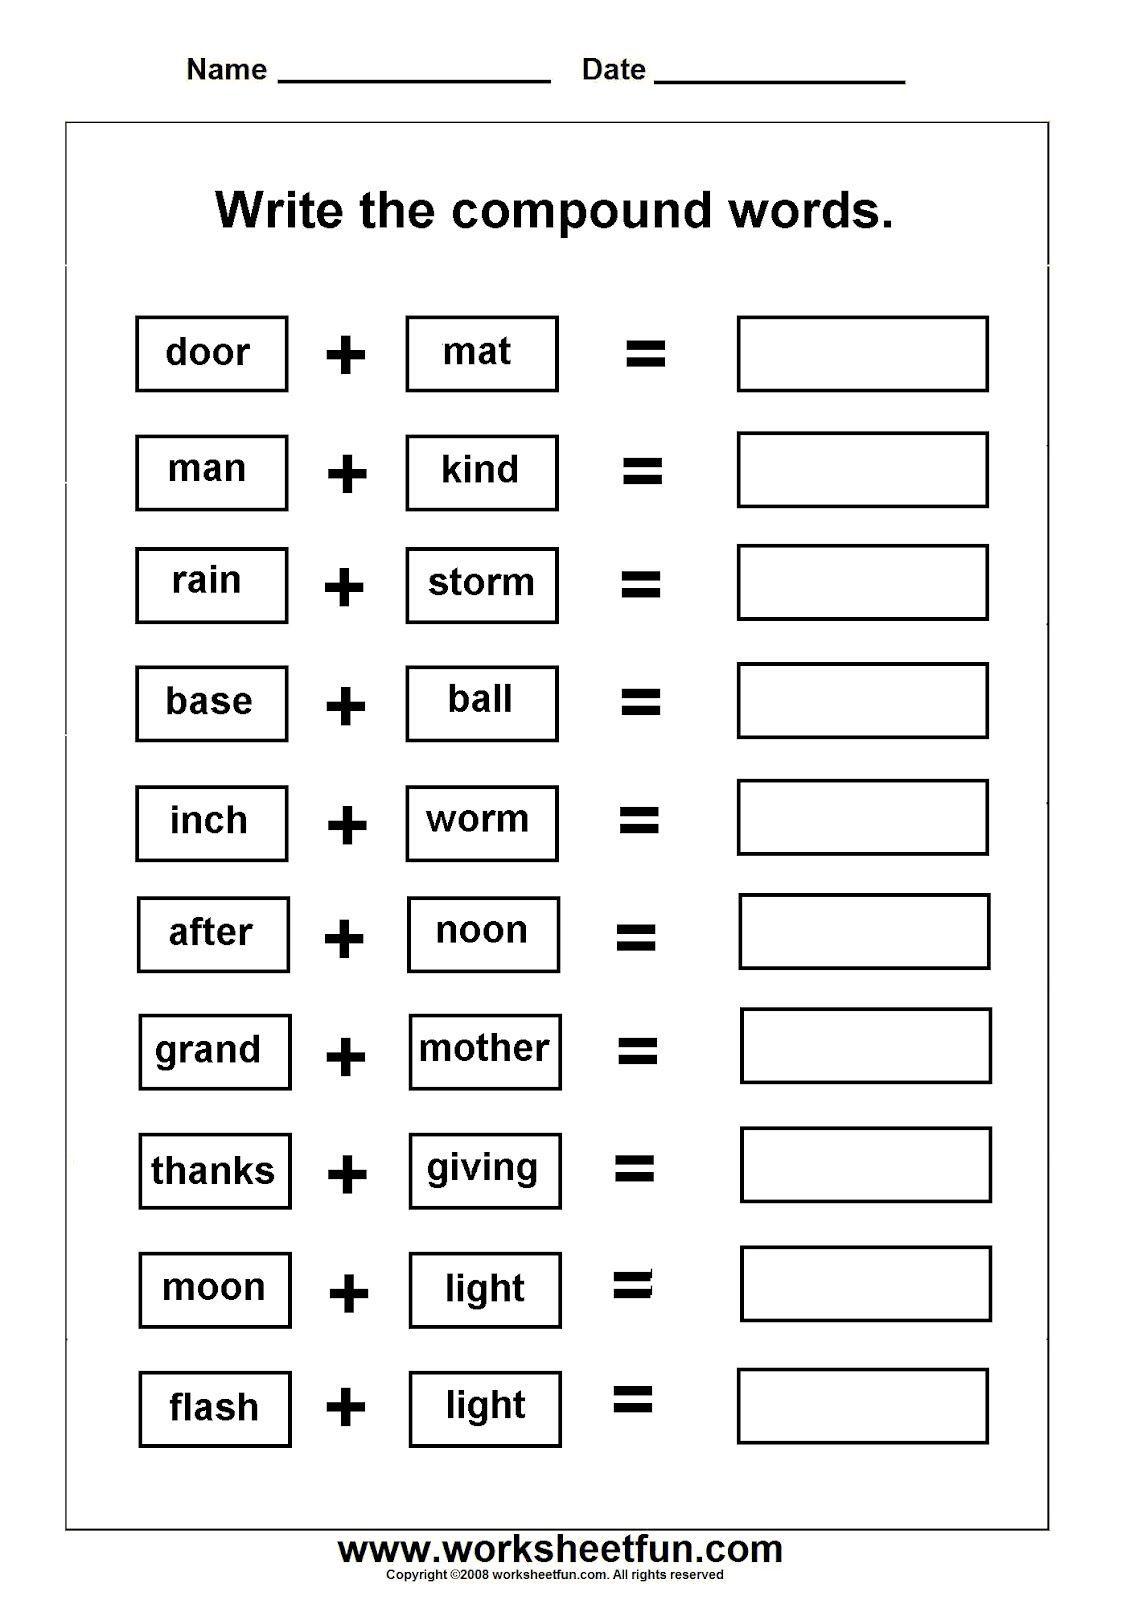 Compound Words Worksheets Grade 3 Worksheets Pound Words